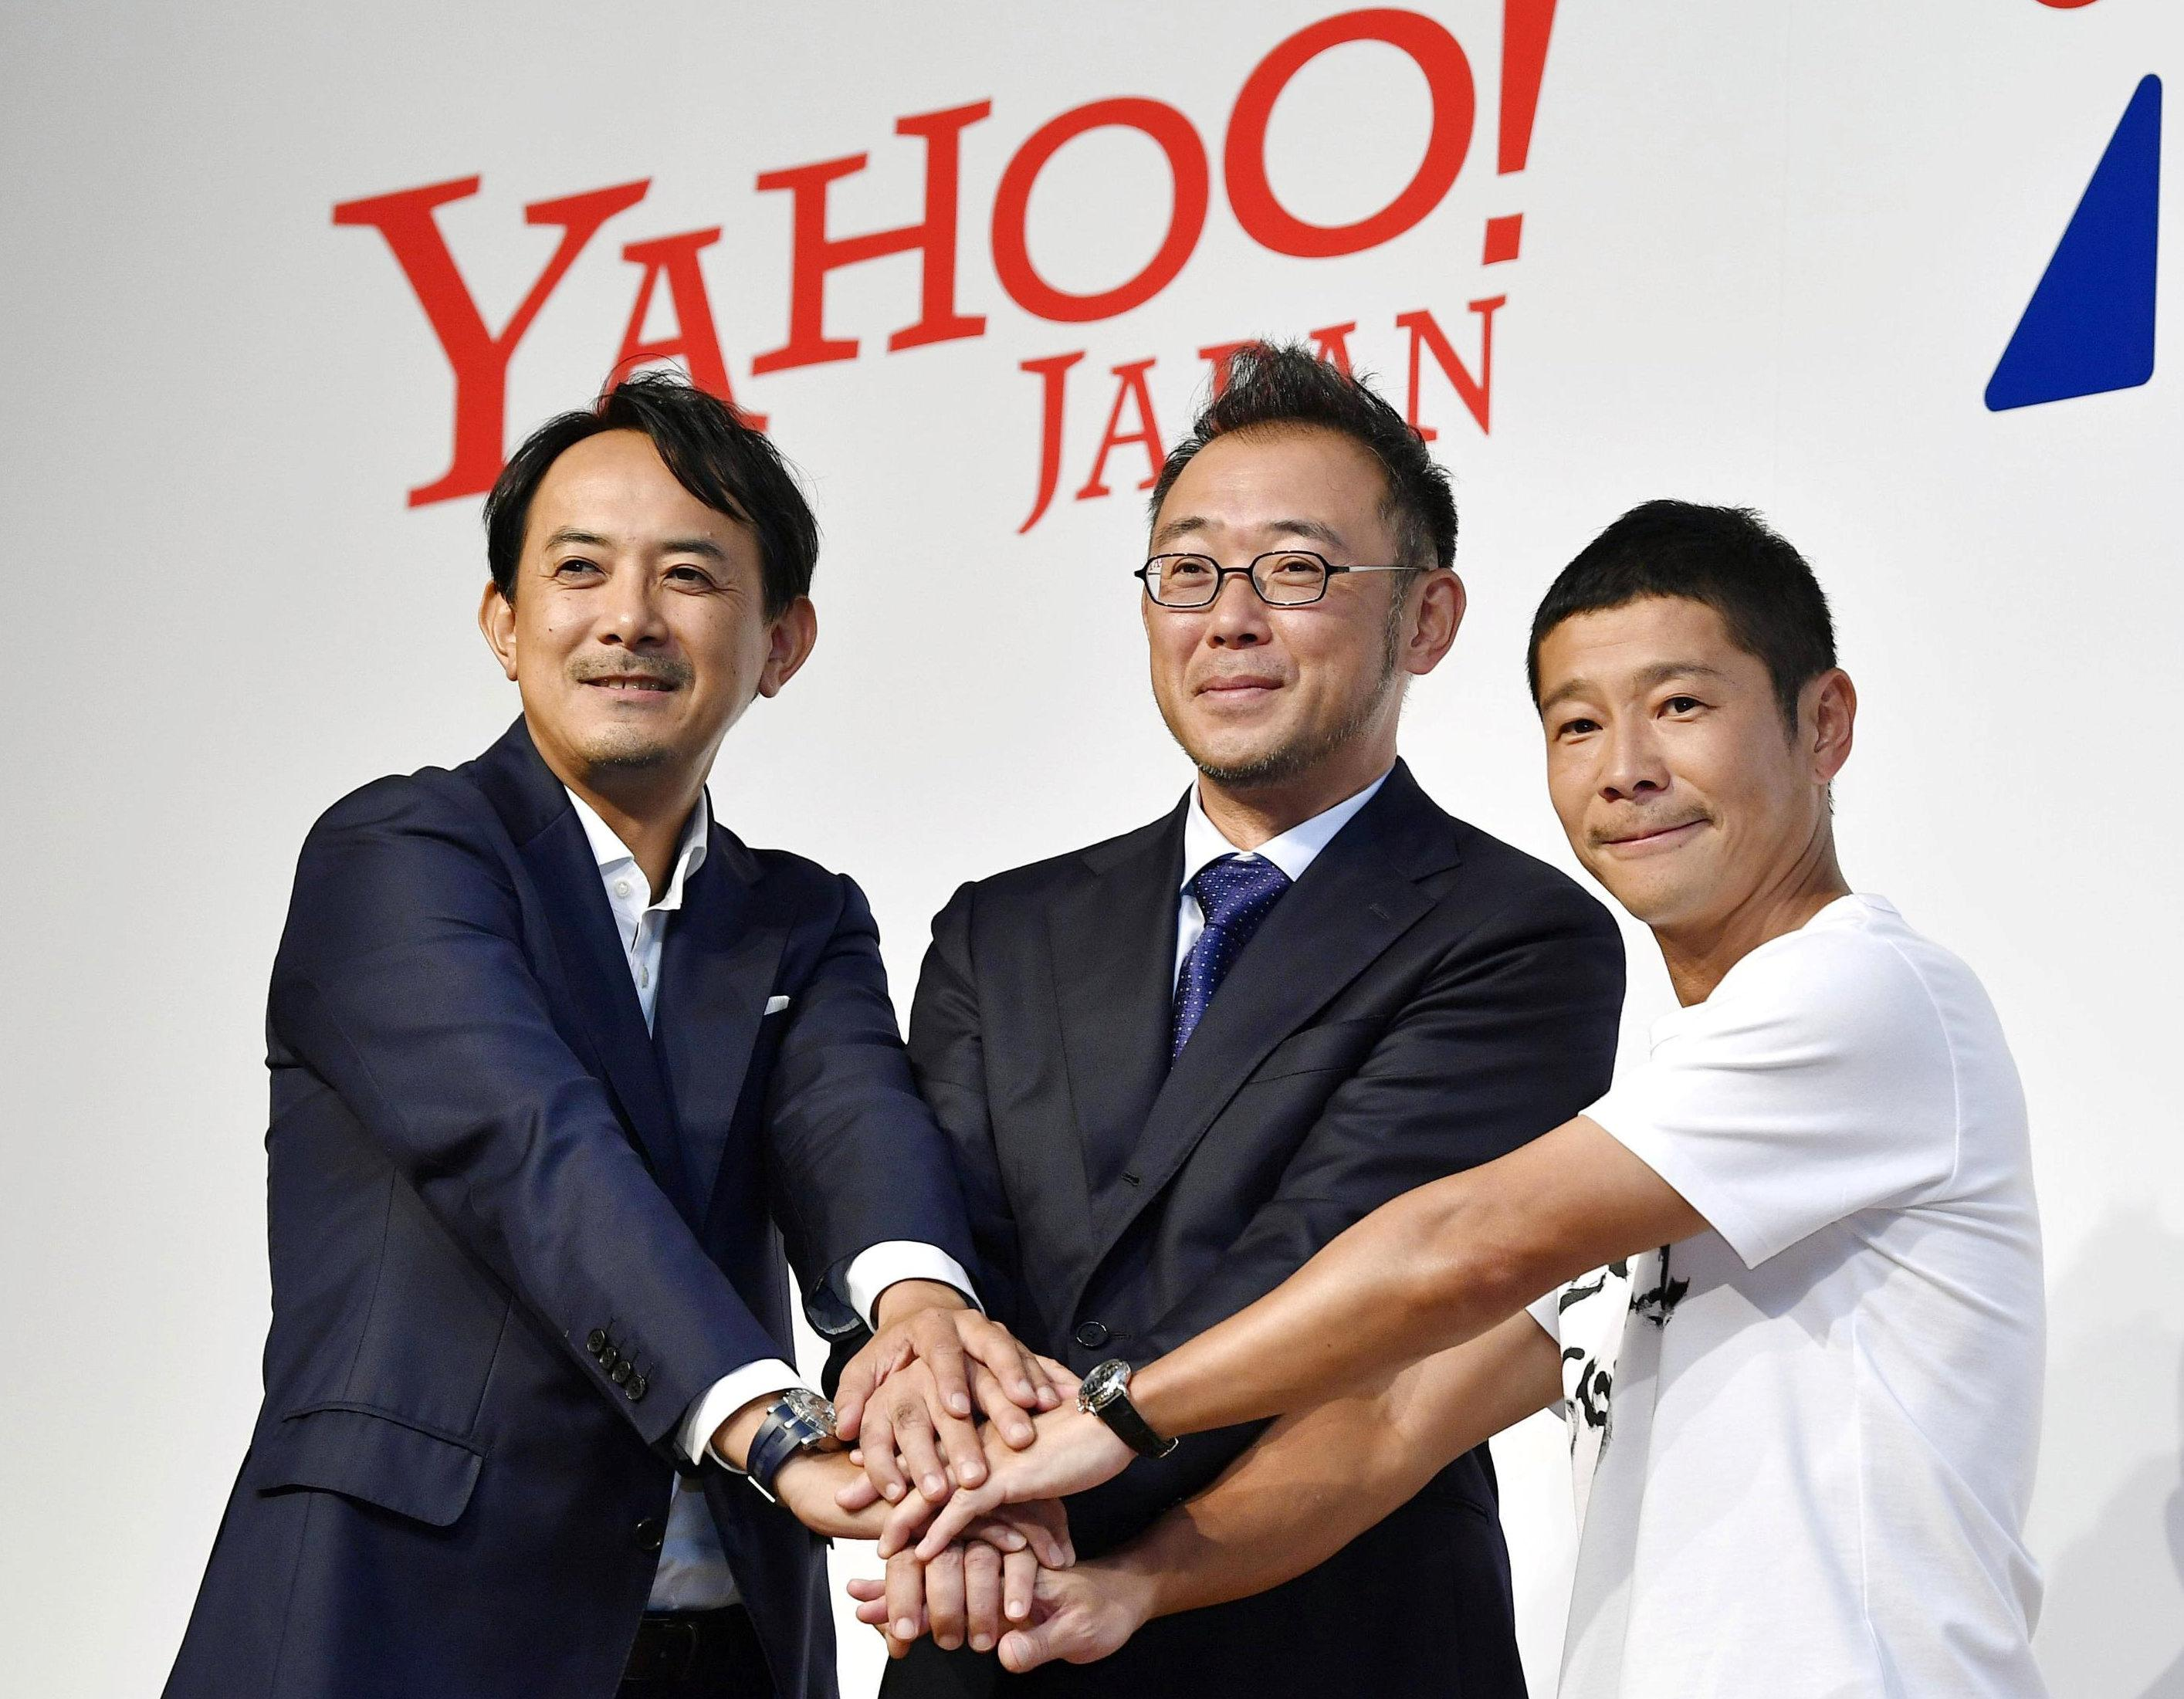 Yahoo Japan bids for control of fashion e-tailer Zozo for $3.7 billion